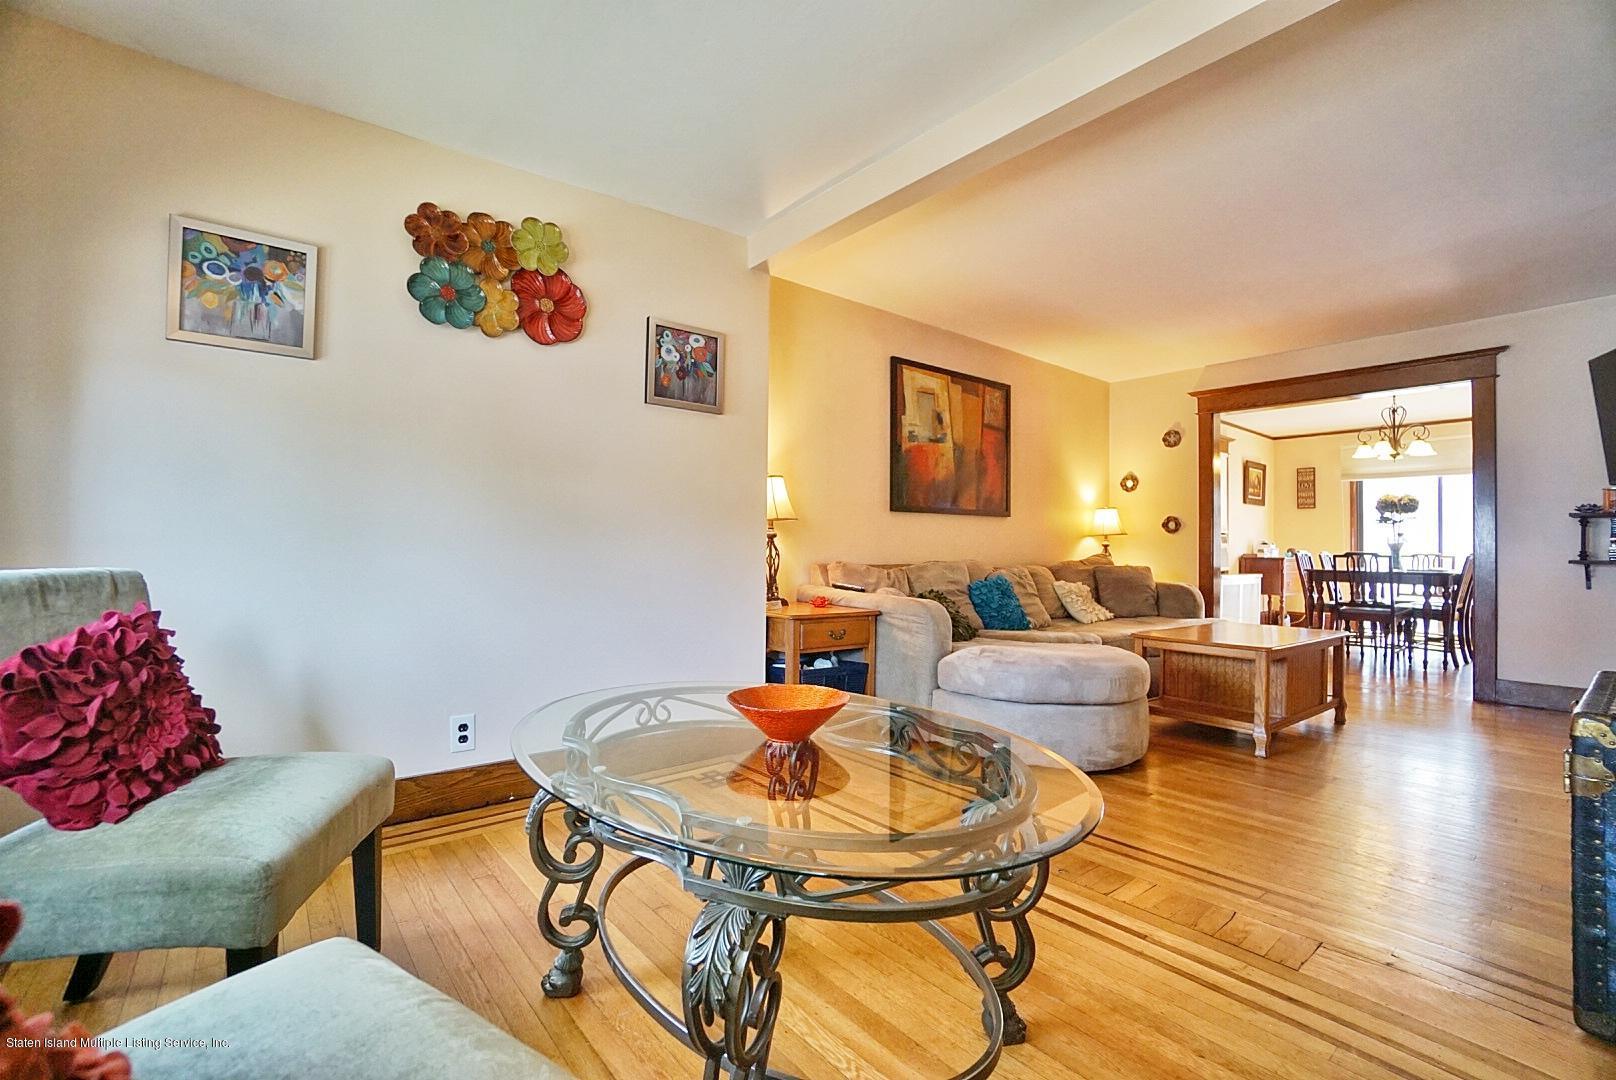 Single Family - Detached 22 Maine Avenue  Staten Island, NY 10314, MLS-1128323-15